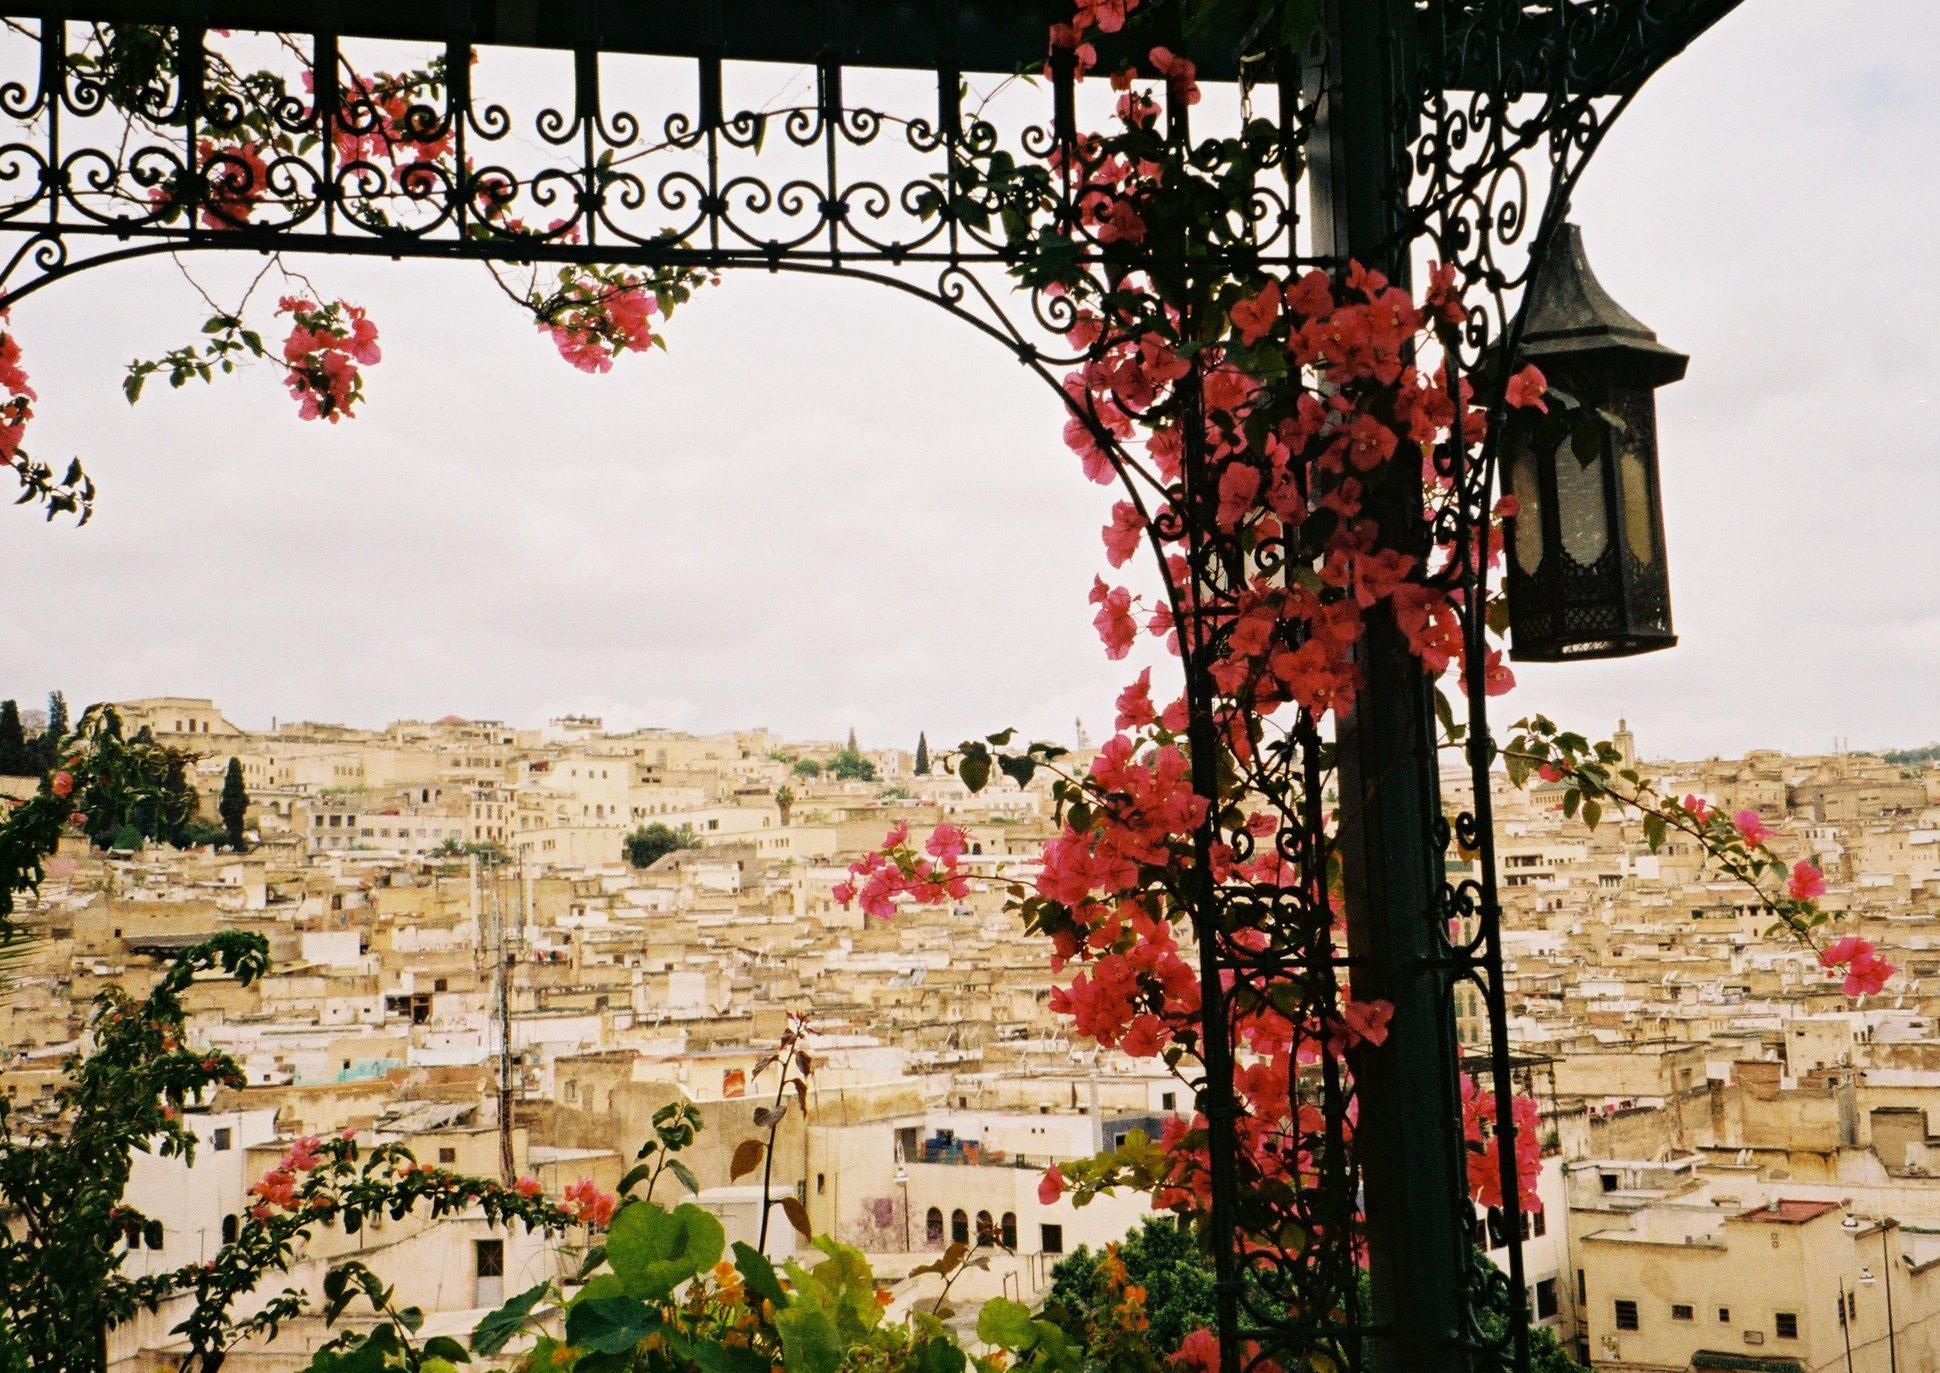 Марокко фото, Путешествие в Марокко, Мекнес Фото